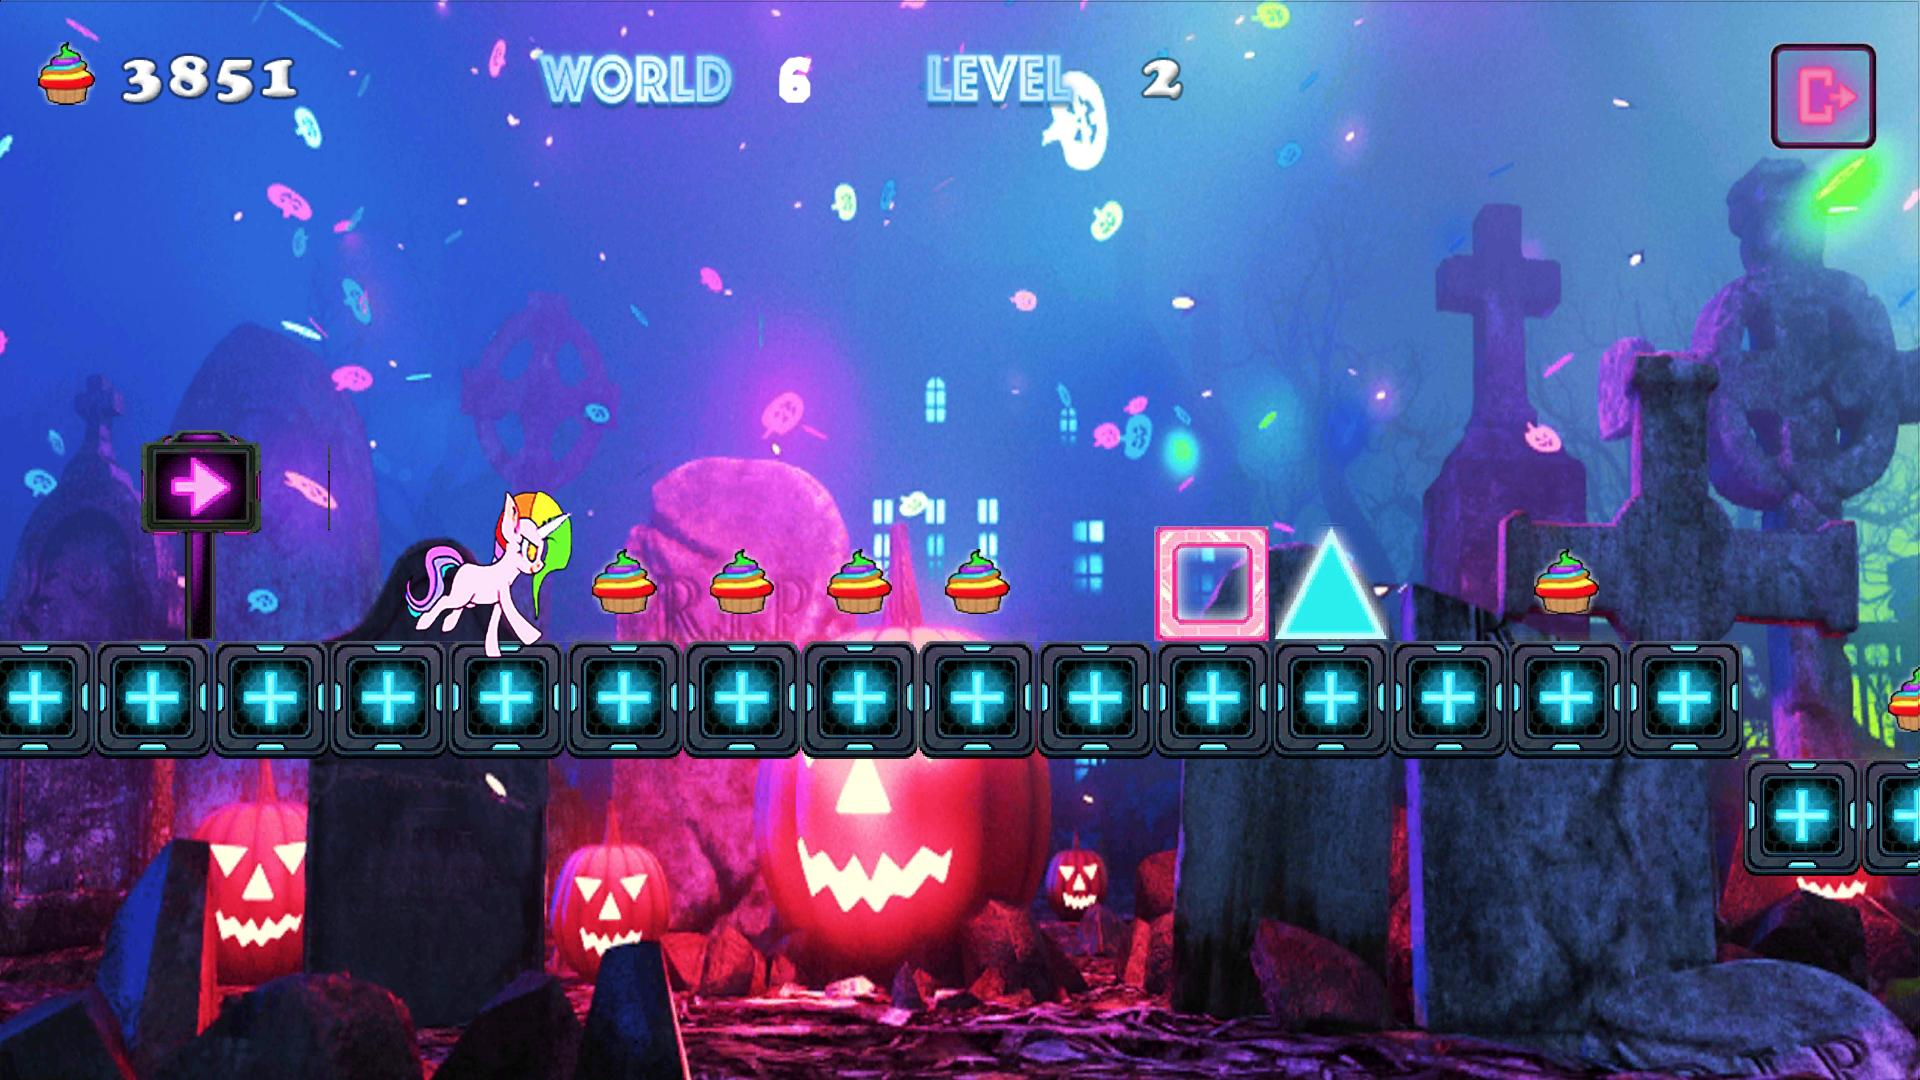 Unicorn Dash Neon Lights Unicorn Games mlp games 2.8.105 Screenshot 14